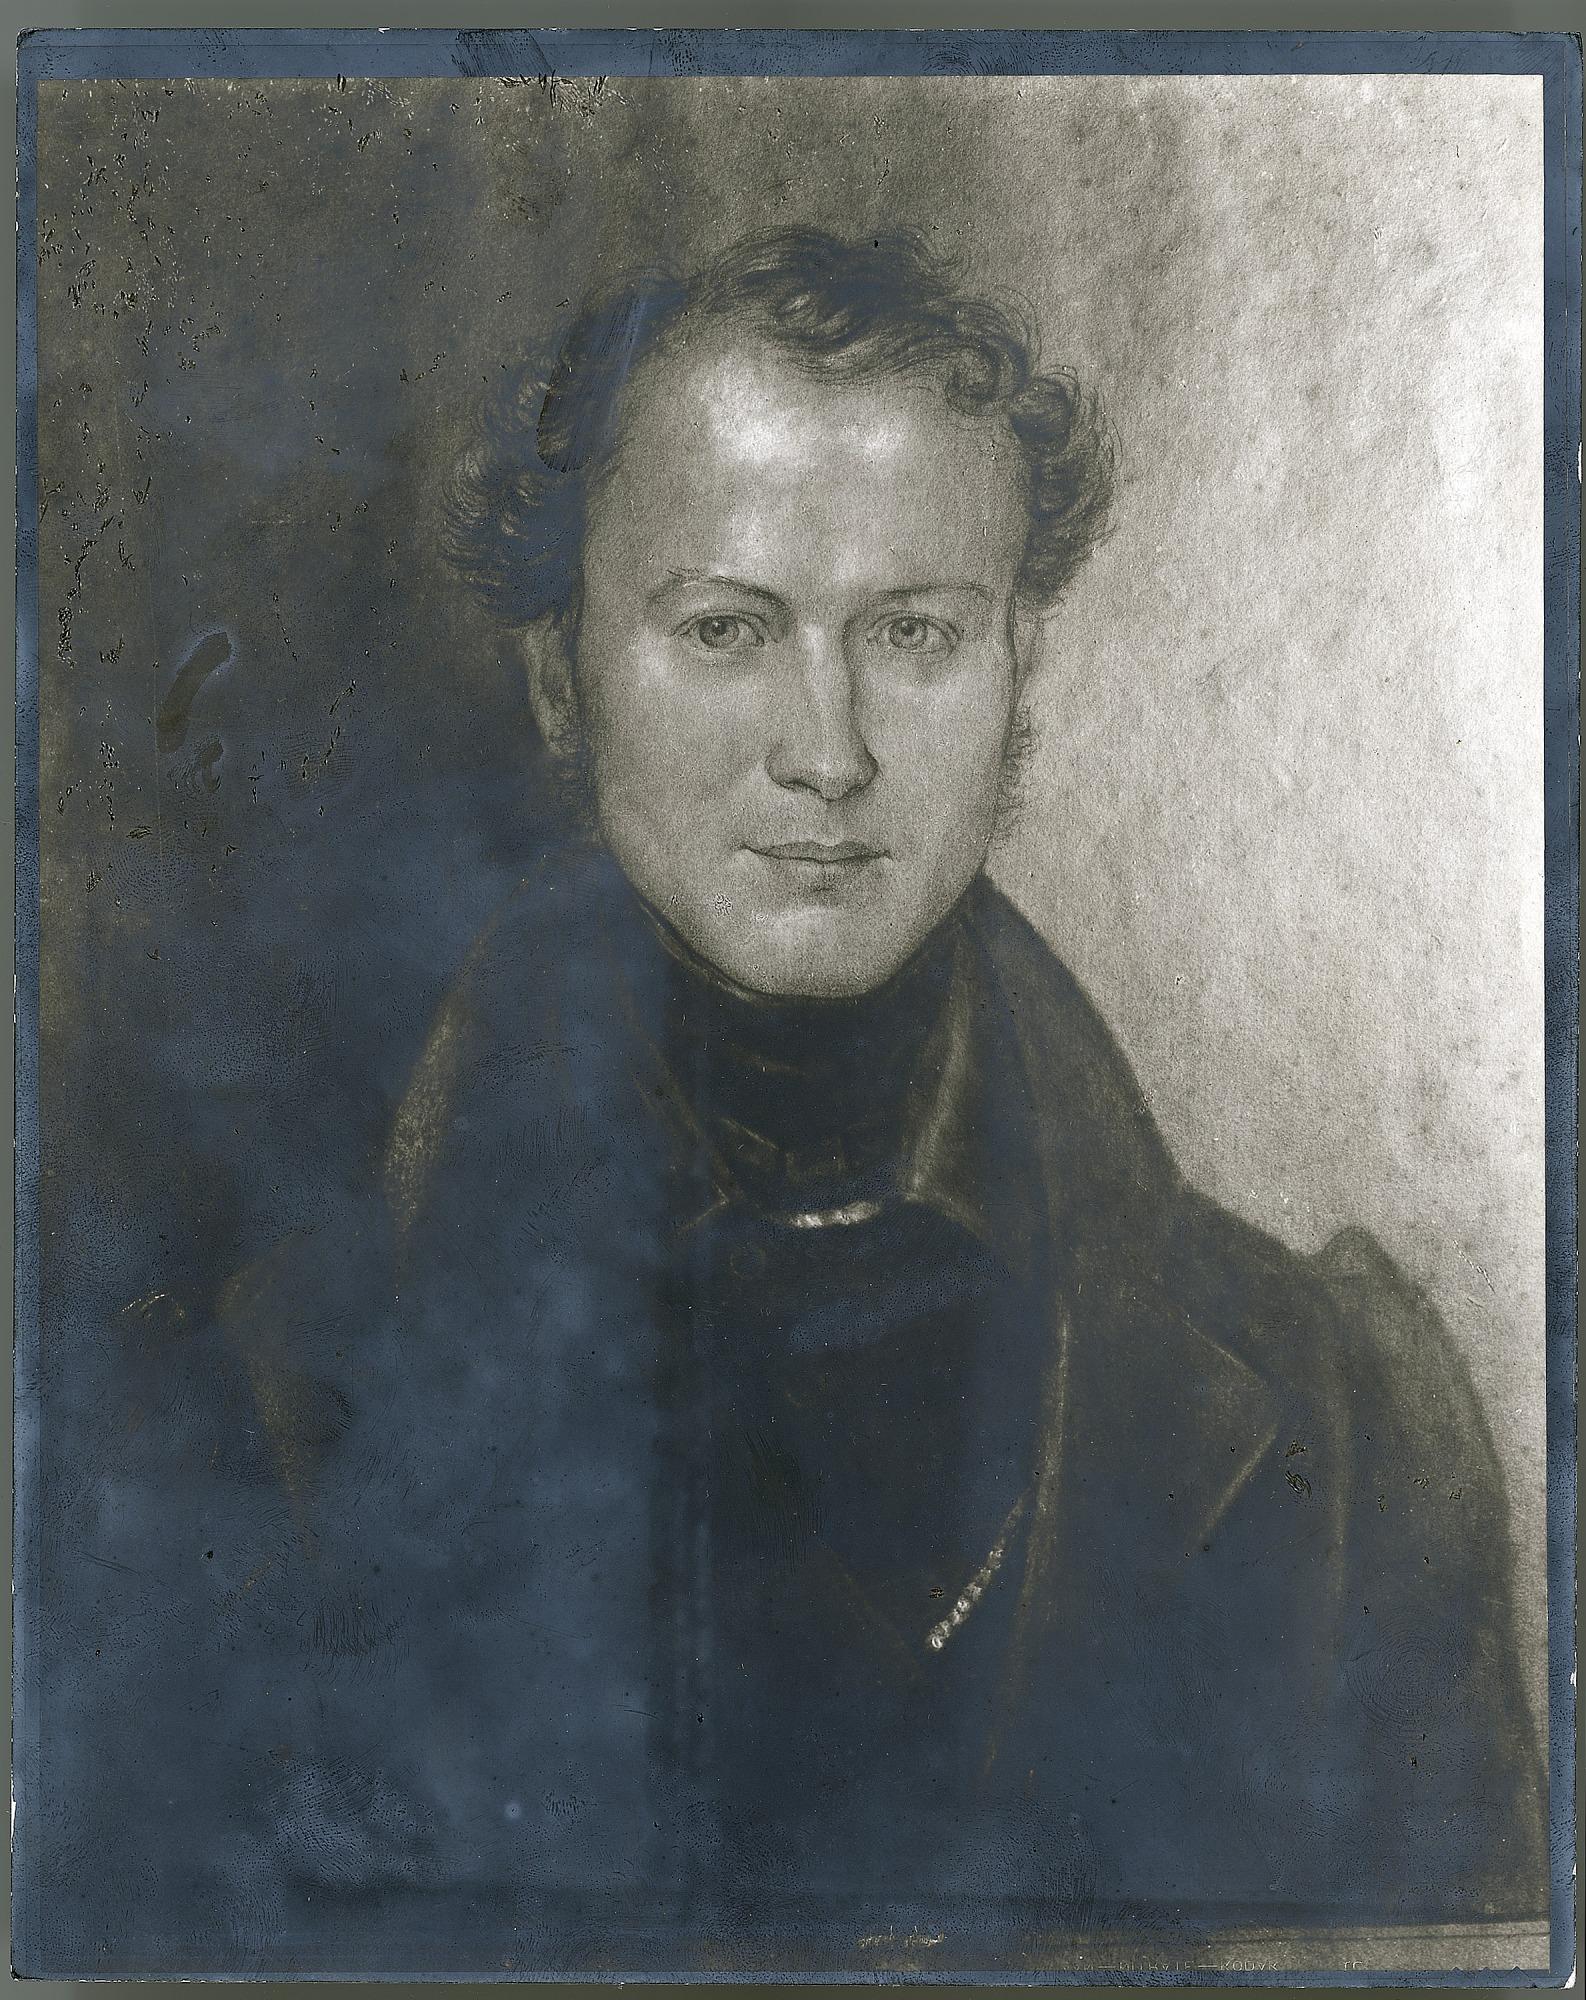 William Dunlop Brackenridge, by Unknown, c. 1830s, Smithsonian Archives - History Div, 2005-1378.